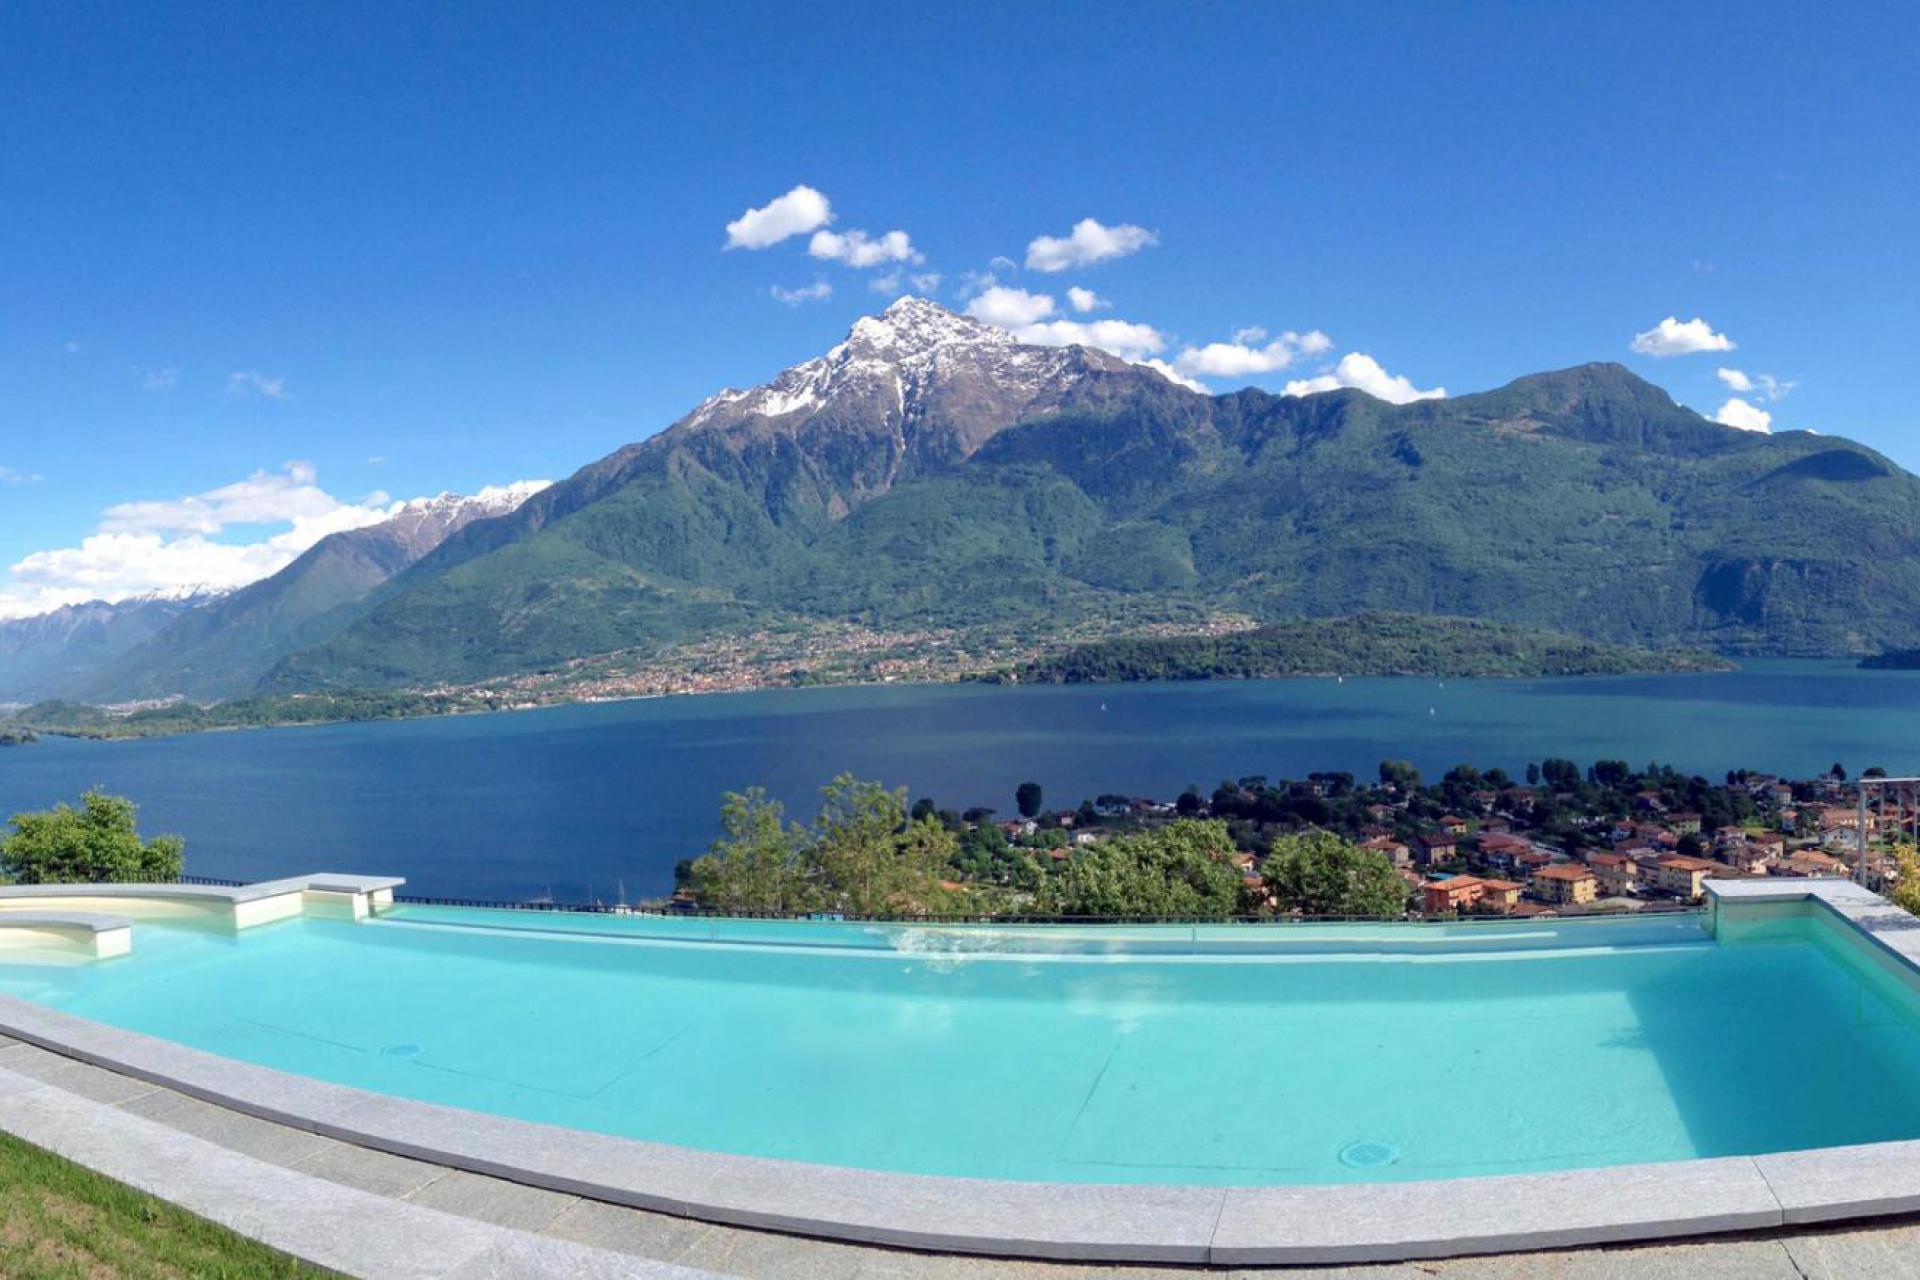 Agriturismo Lake Como and Lake Garda Residence with unique view of Lake Como